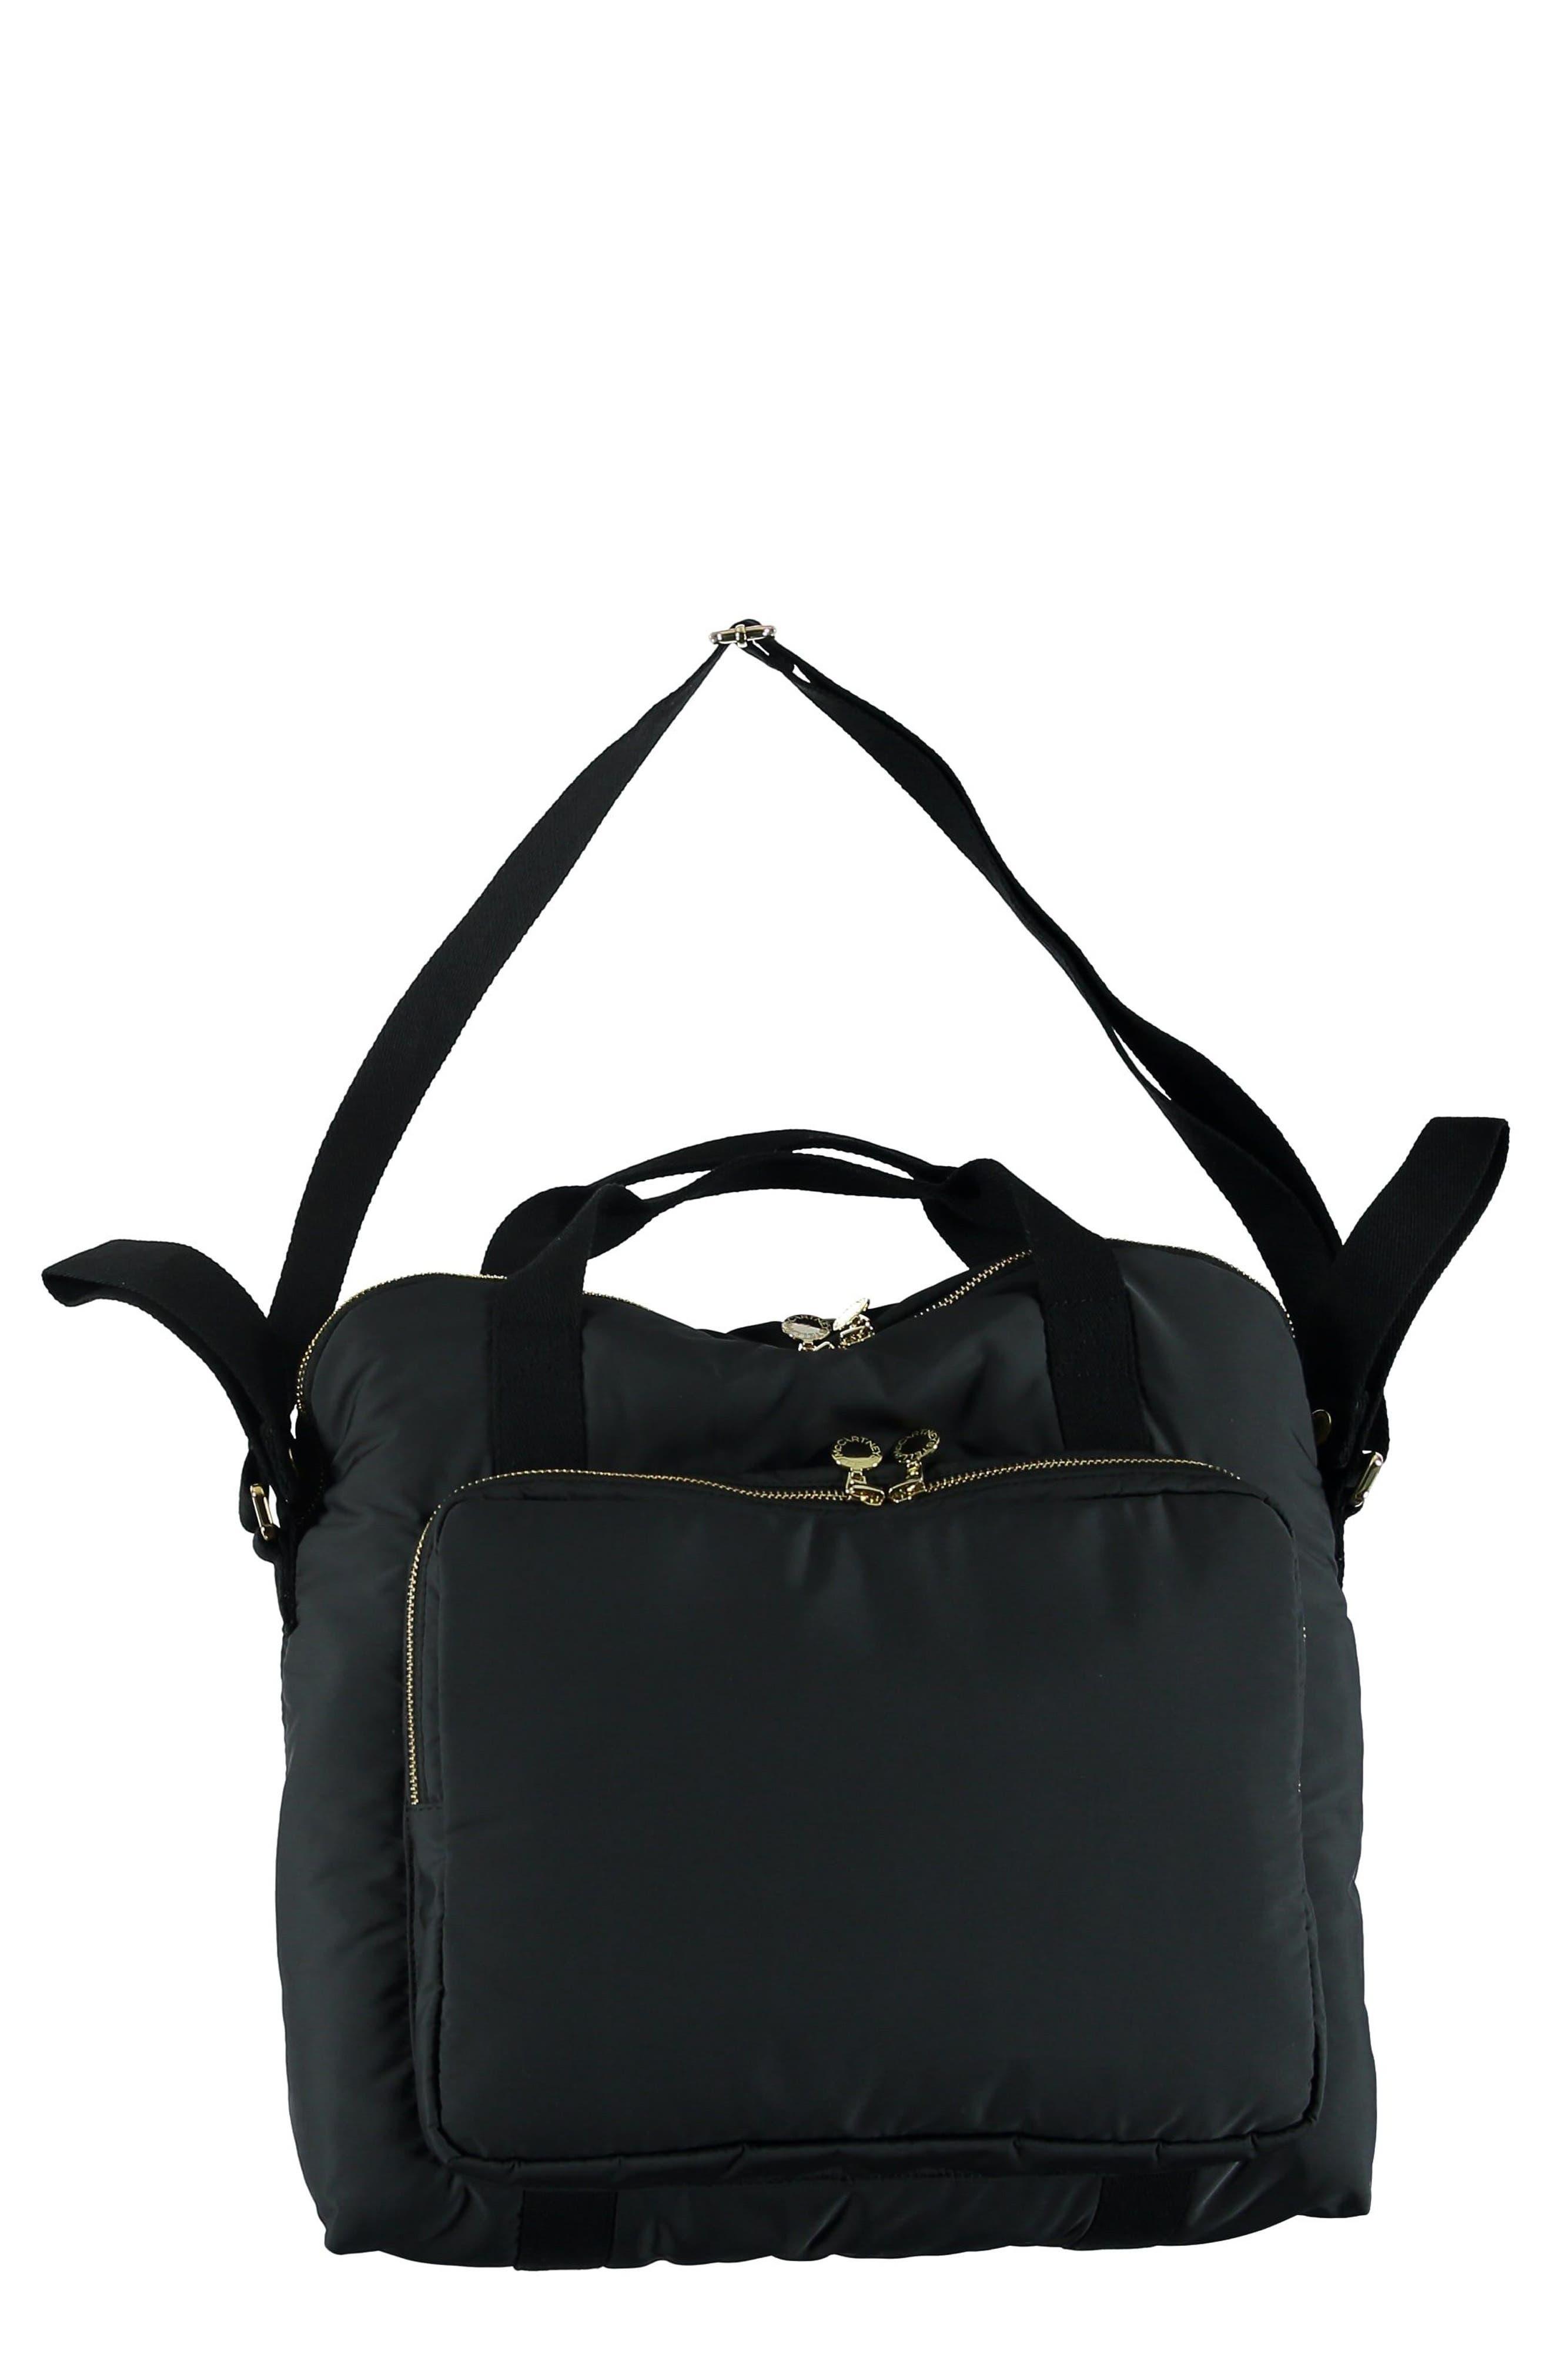 Fern Diaper Bag,                             Main thumbnail 1, color,                             1074 BLACK